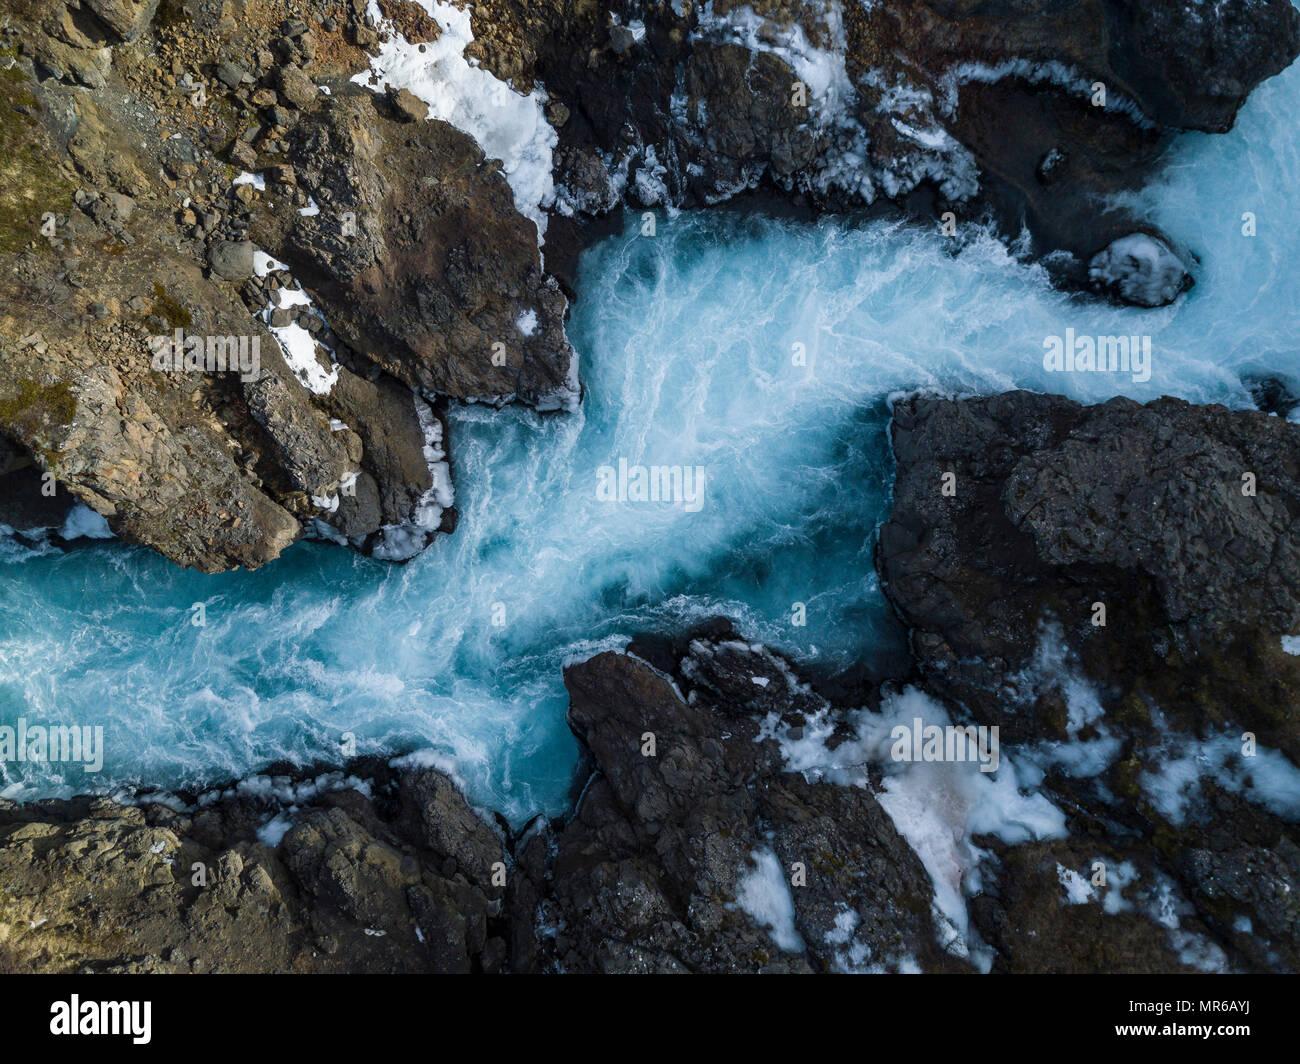 Vista aérea, lluvias río Hvítá desde arriba, cerca de las cascadas Hraunfossar, West Island, Islandia Imagen De Stock